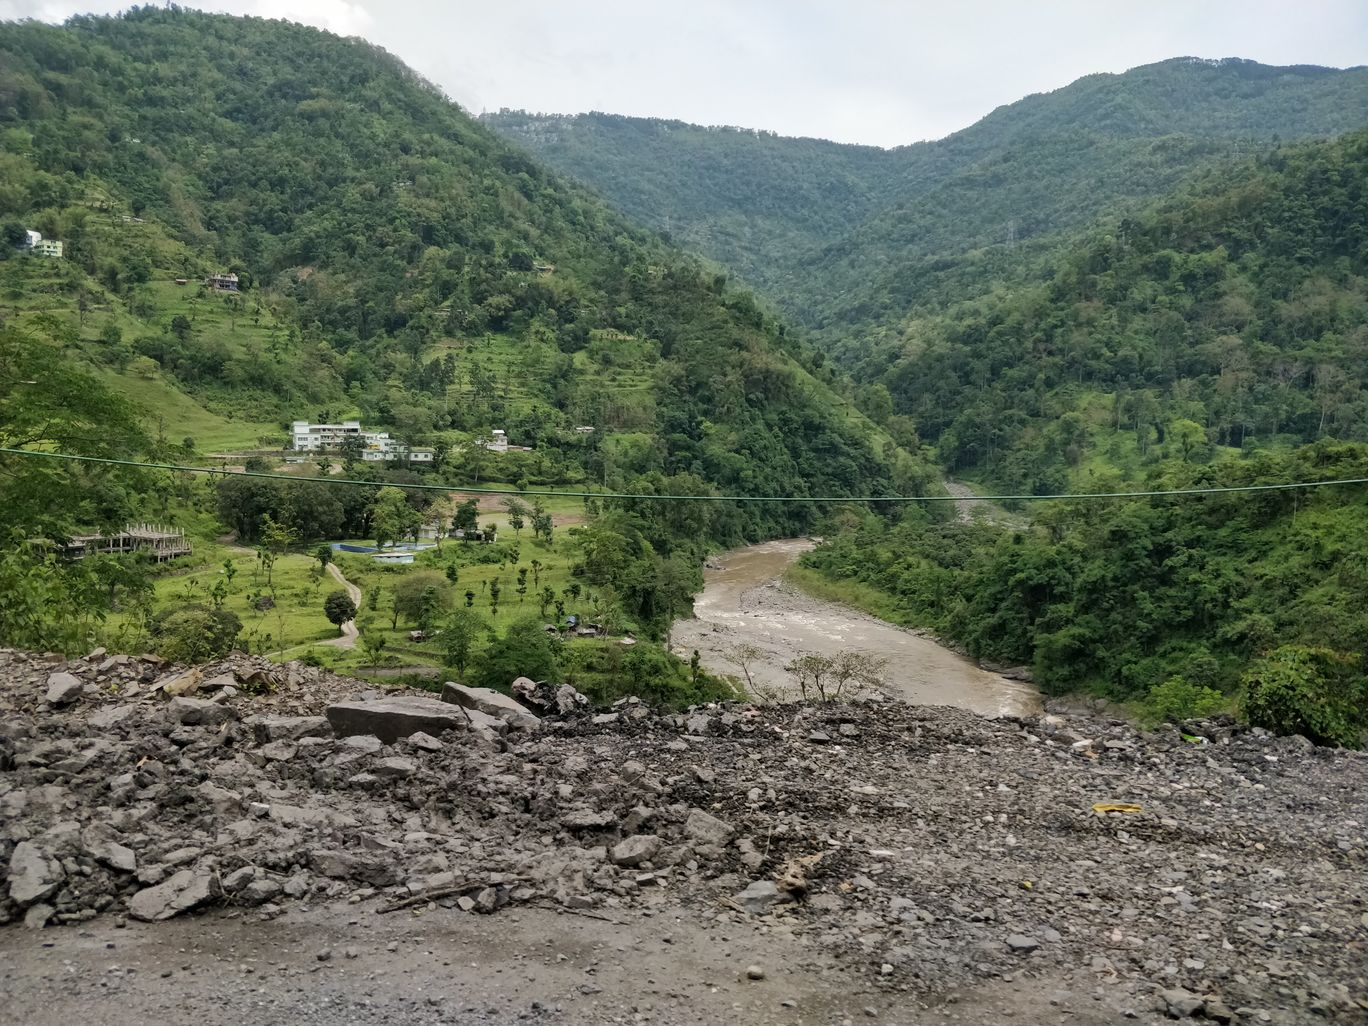 Photo of Northeast Series: West Bengal - Sikkim Border By Mahesh Maddala